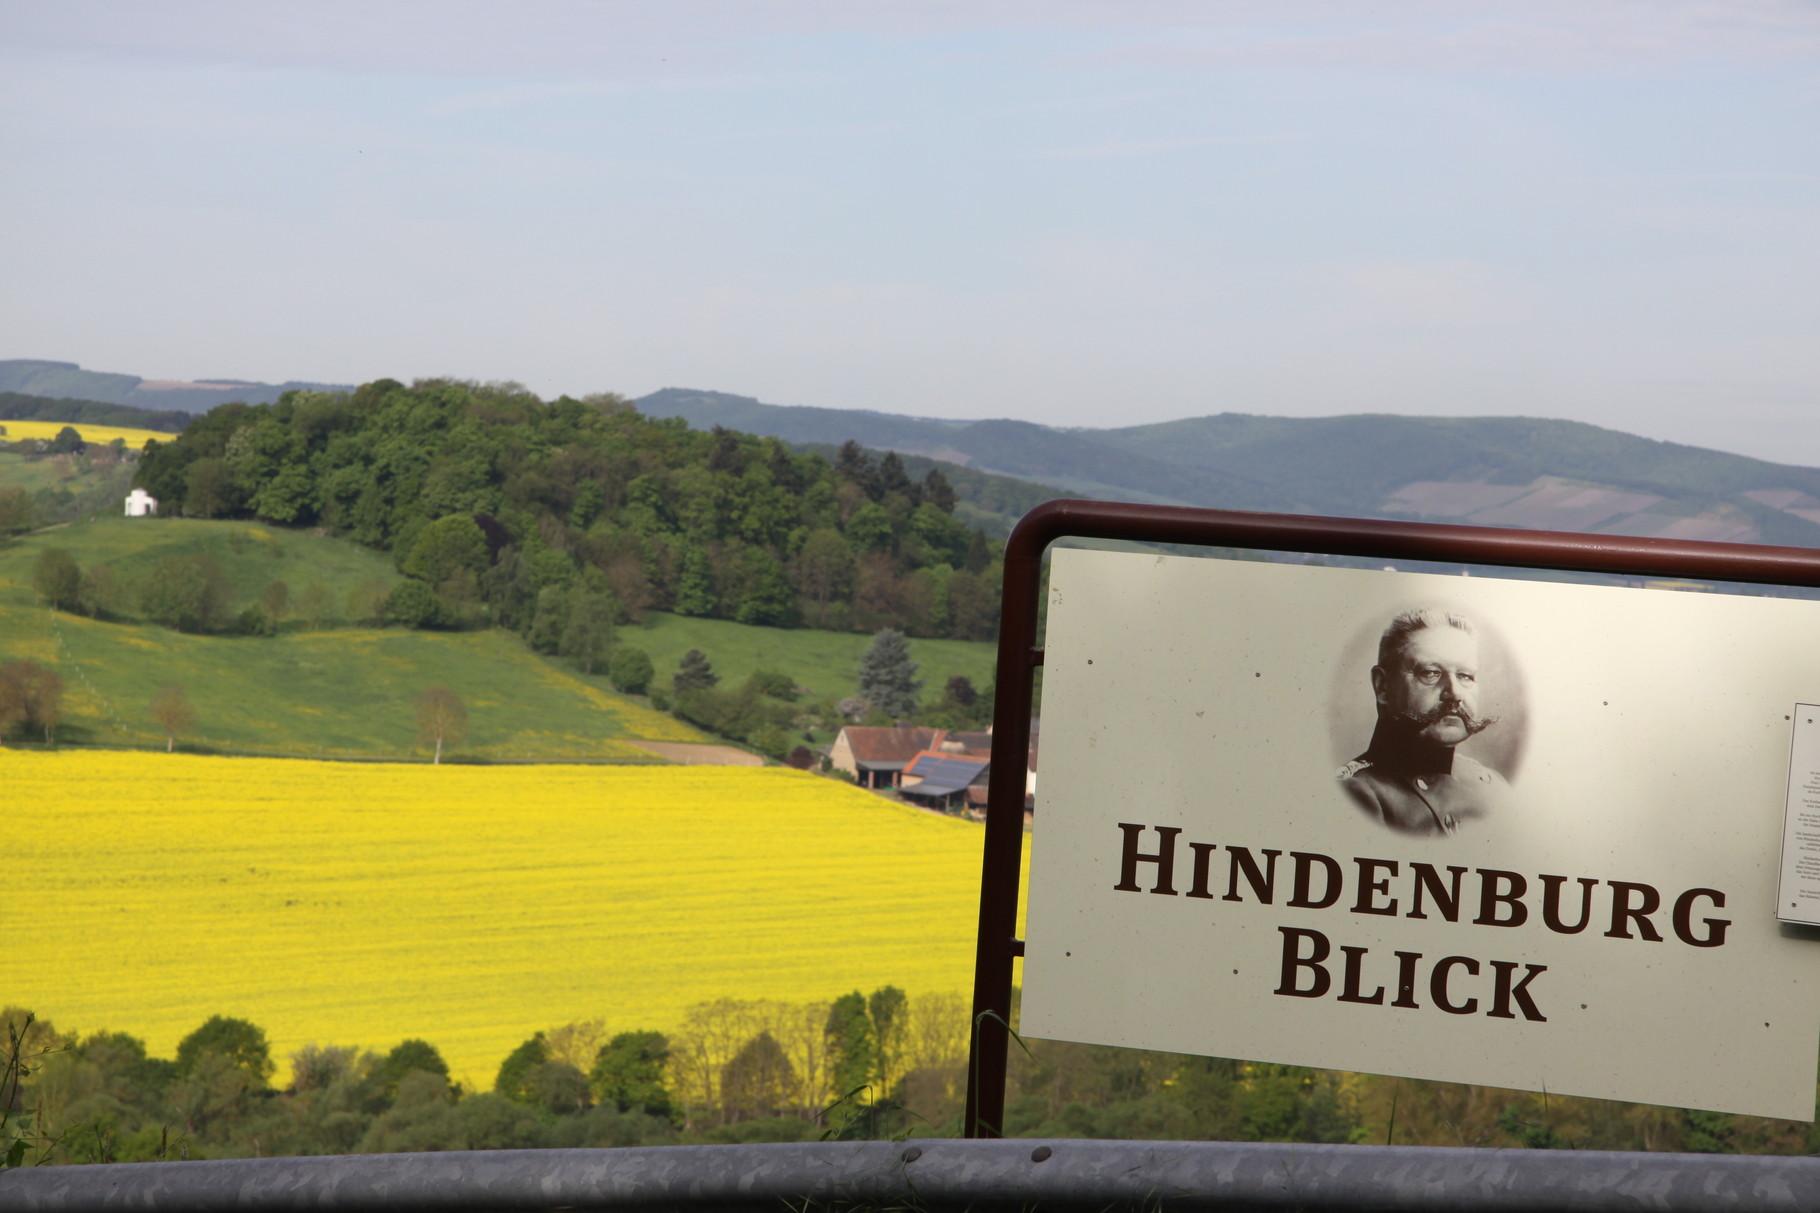 Hindenburgblick